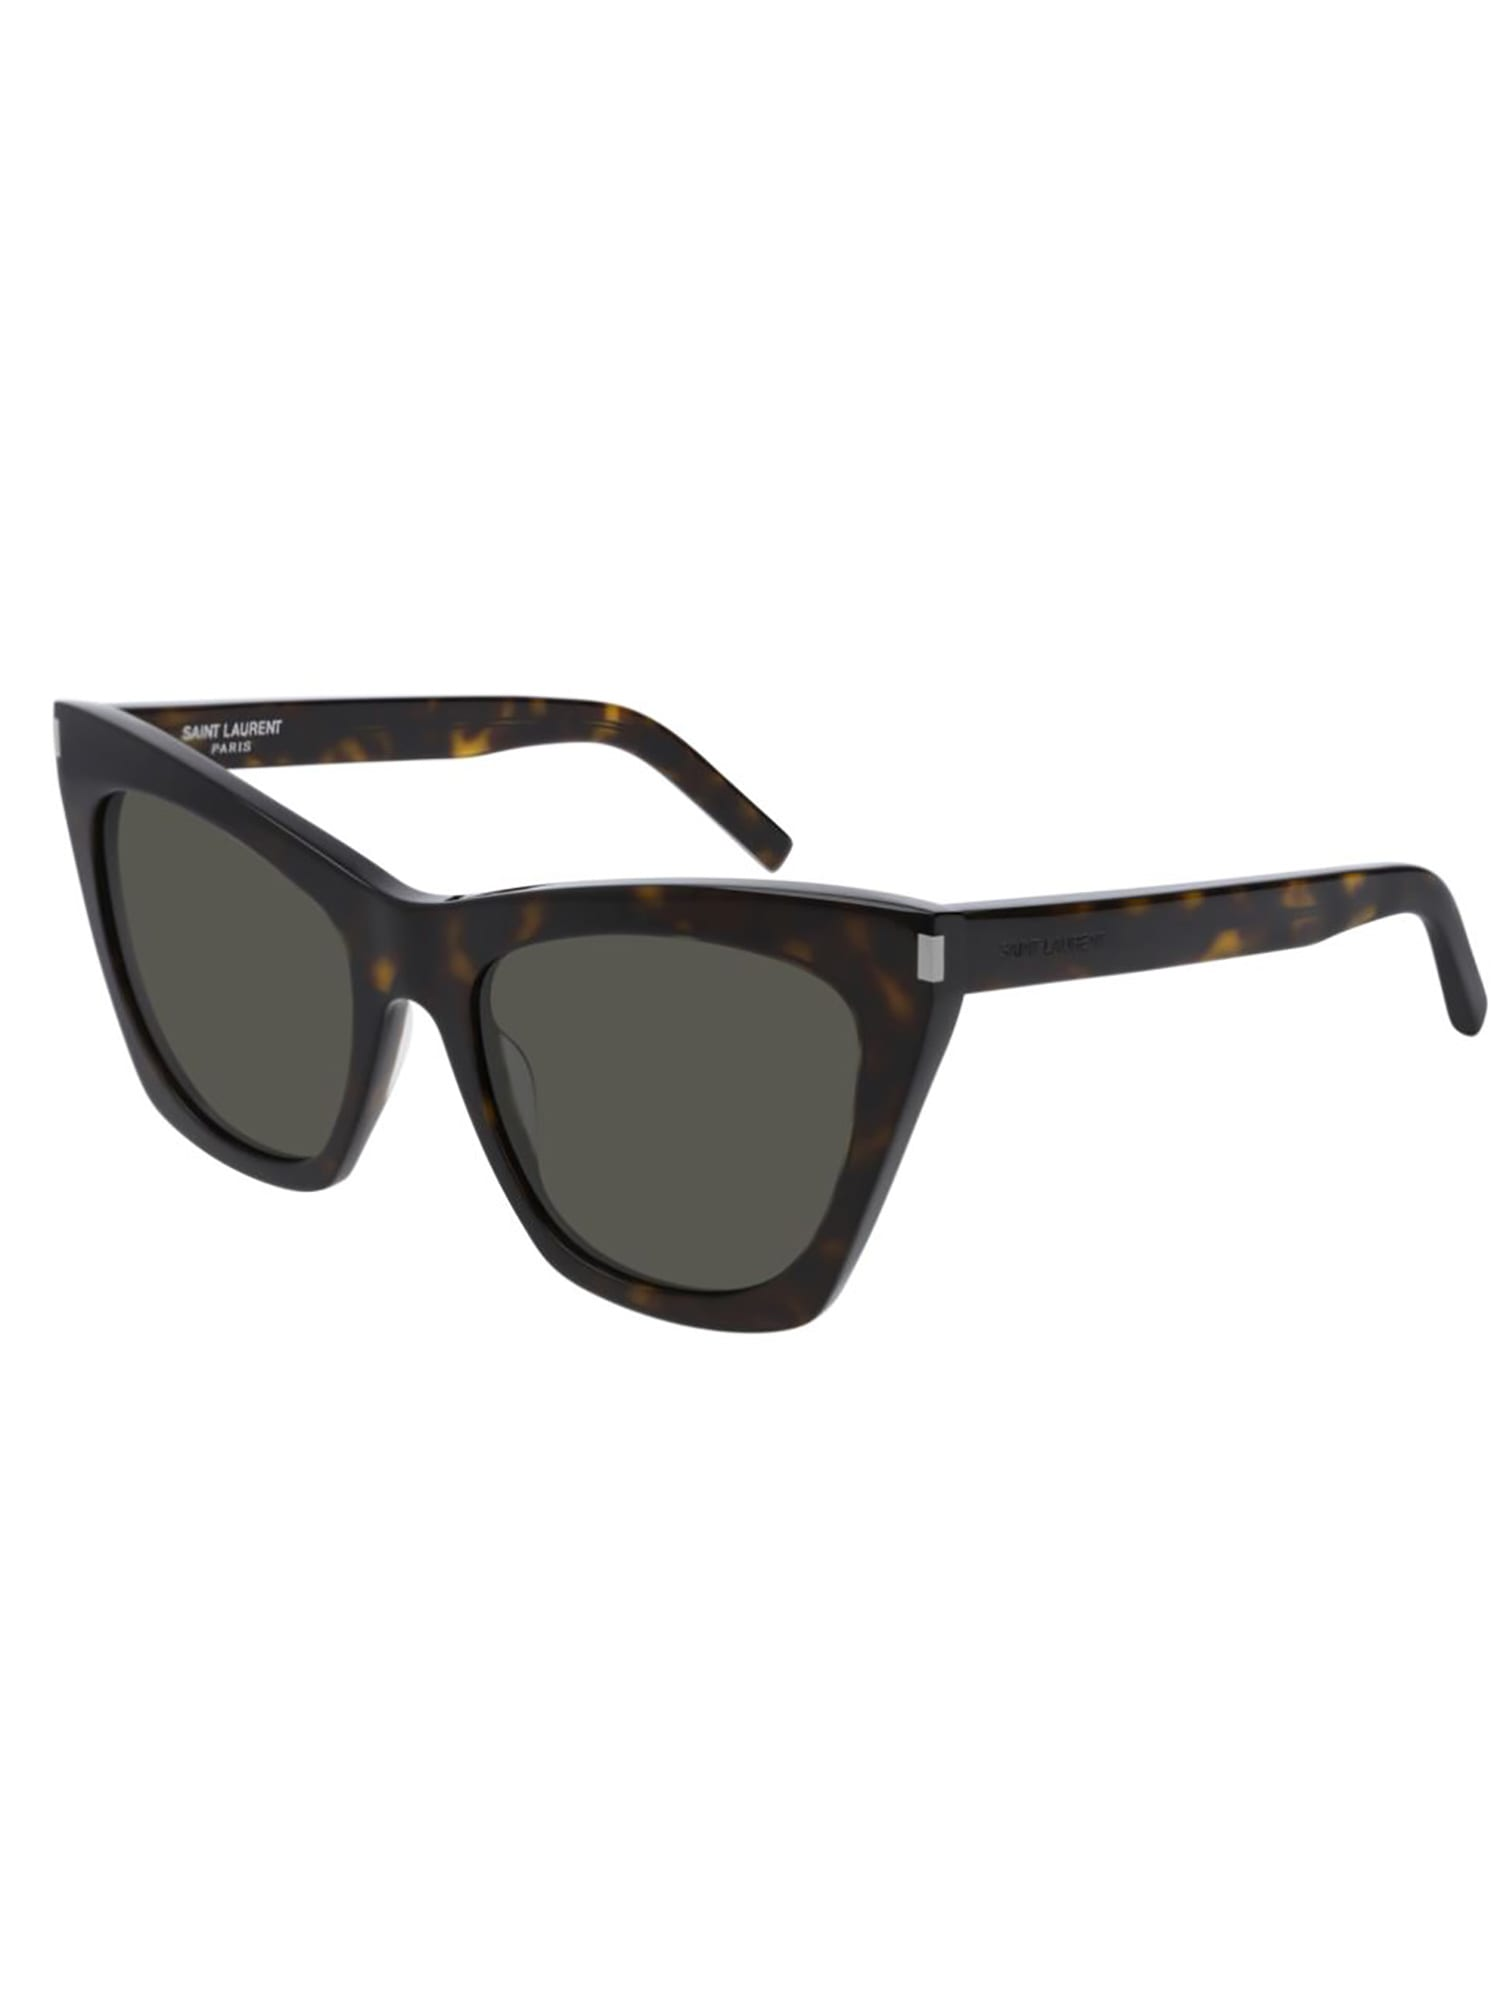 Saint Laurent SL 214 KATE Eyewear